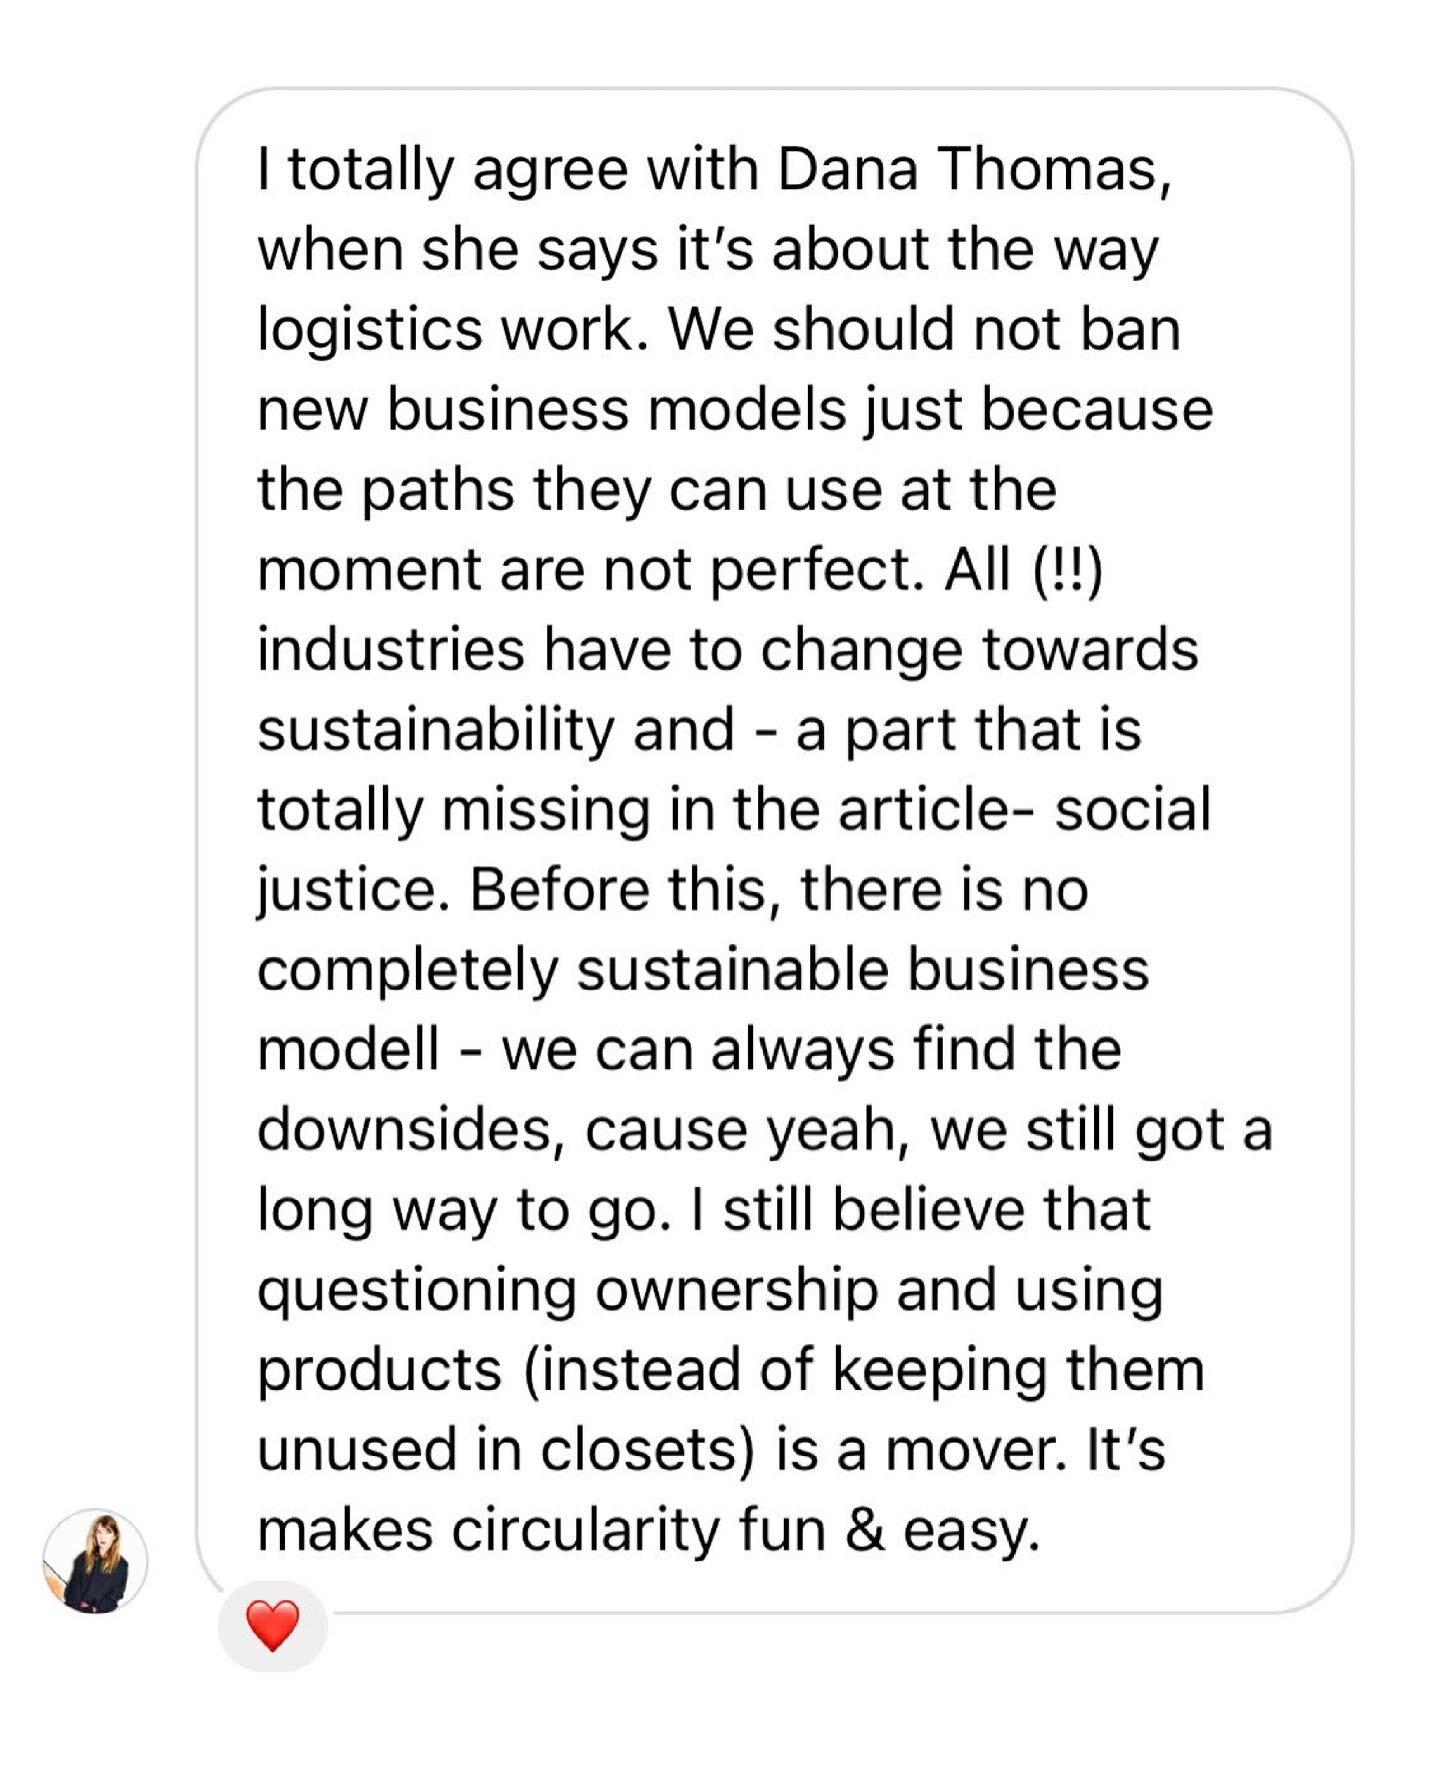 clothing-rental-sustainablethekla-wilkening.JPG